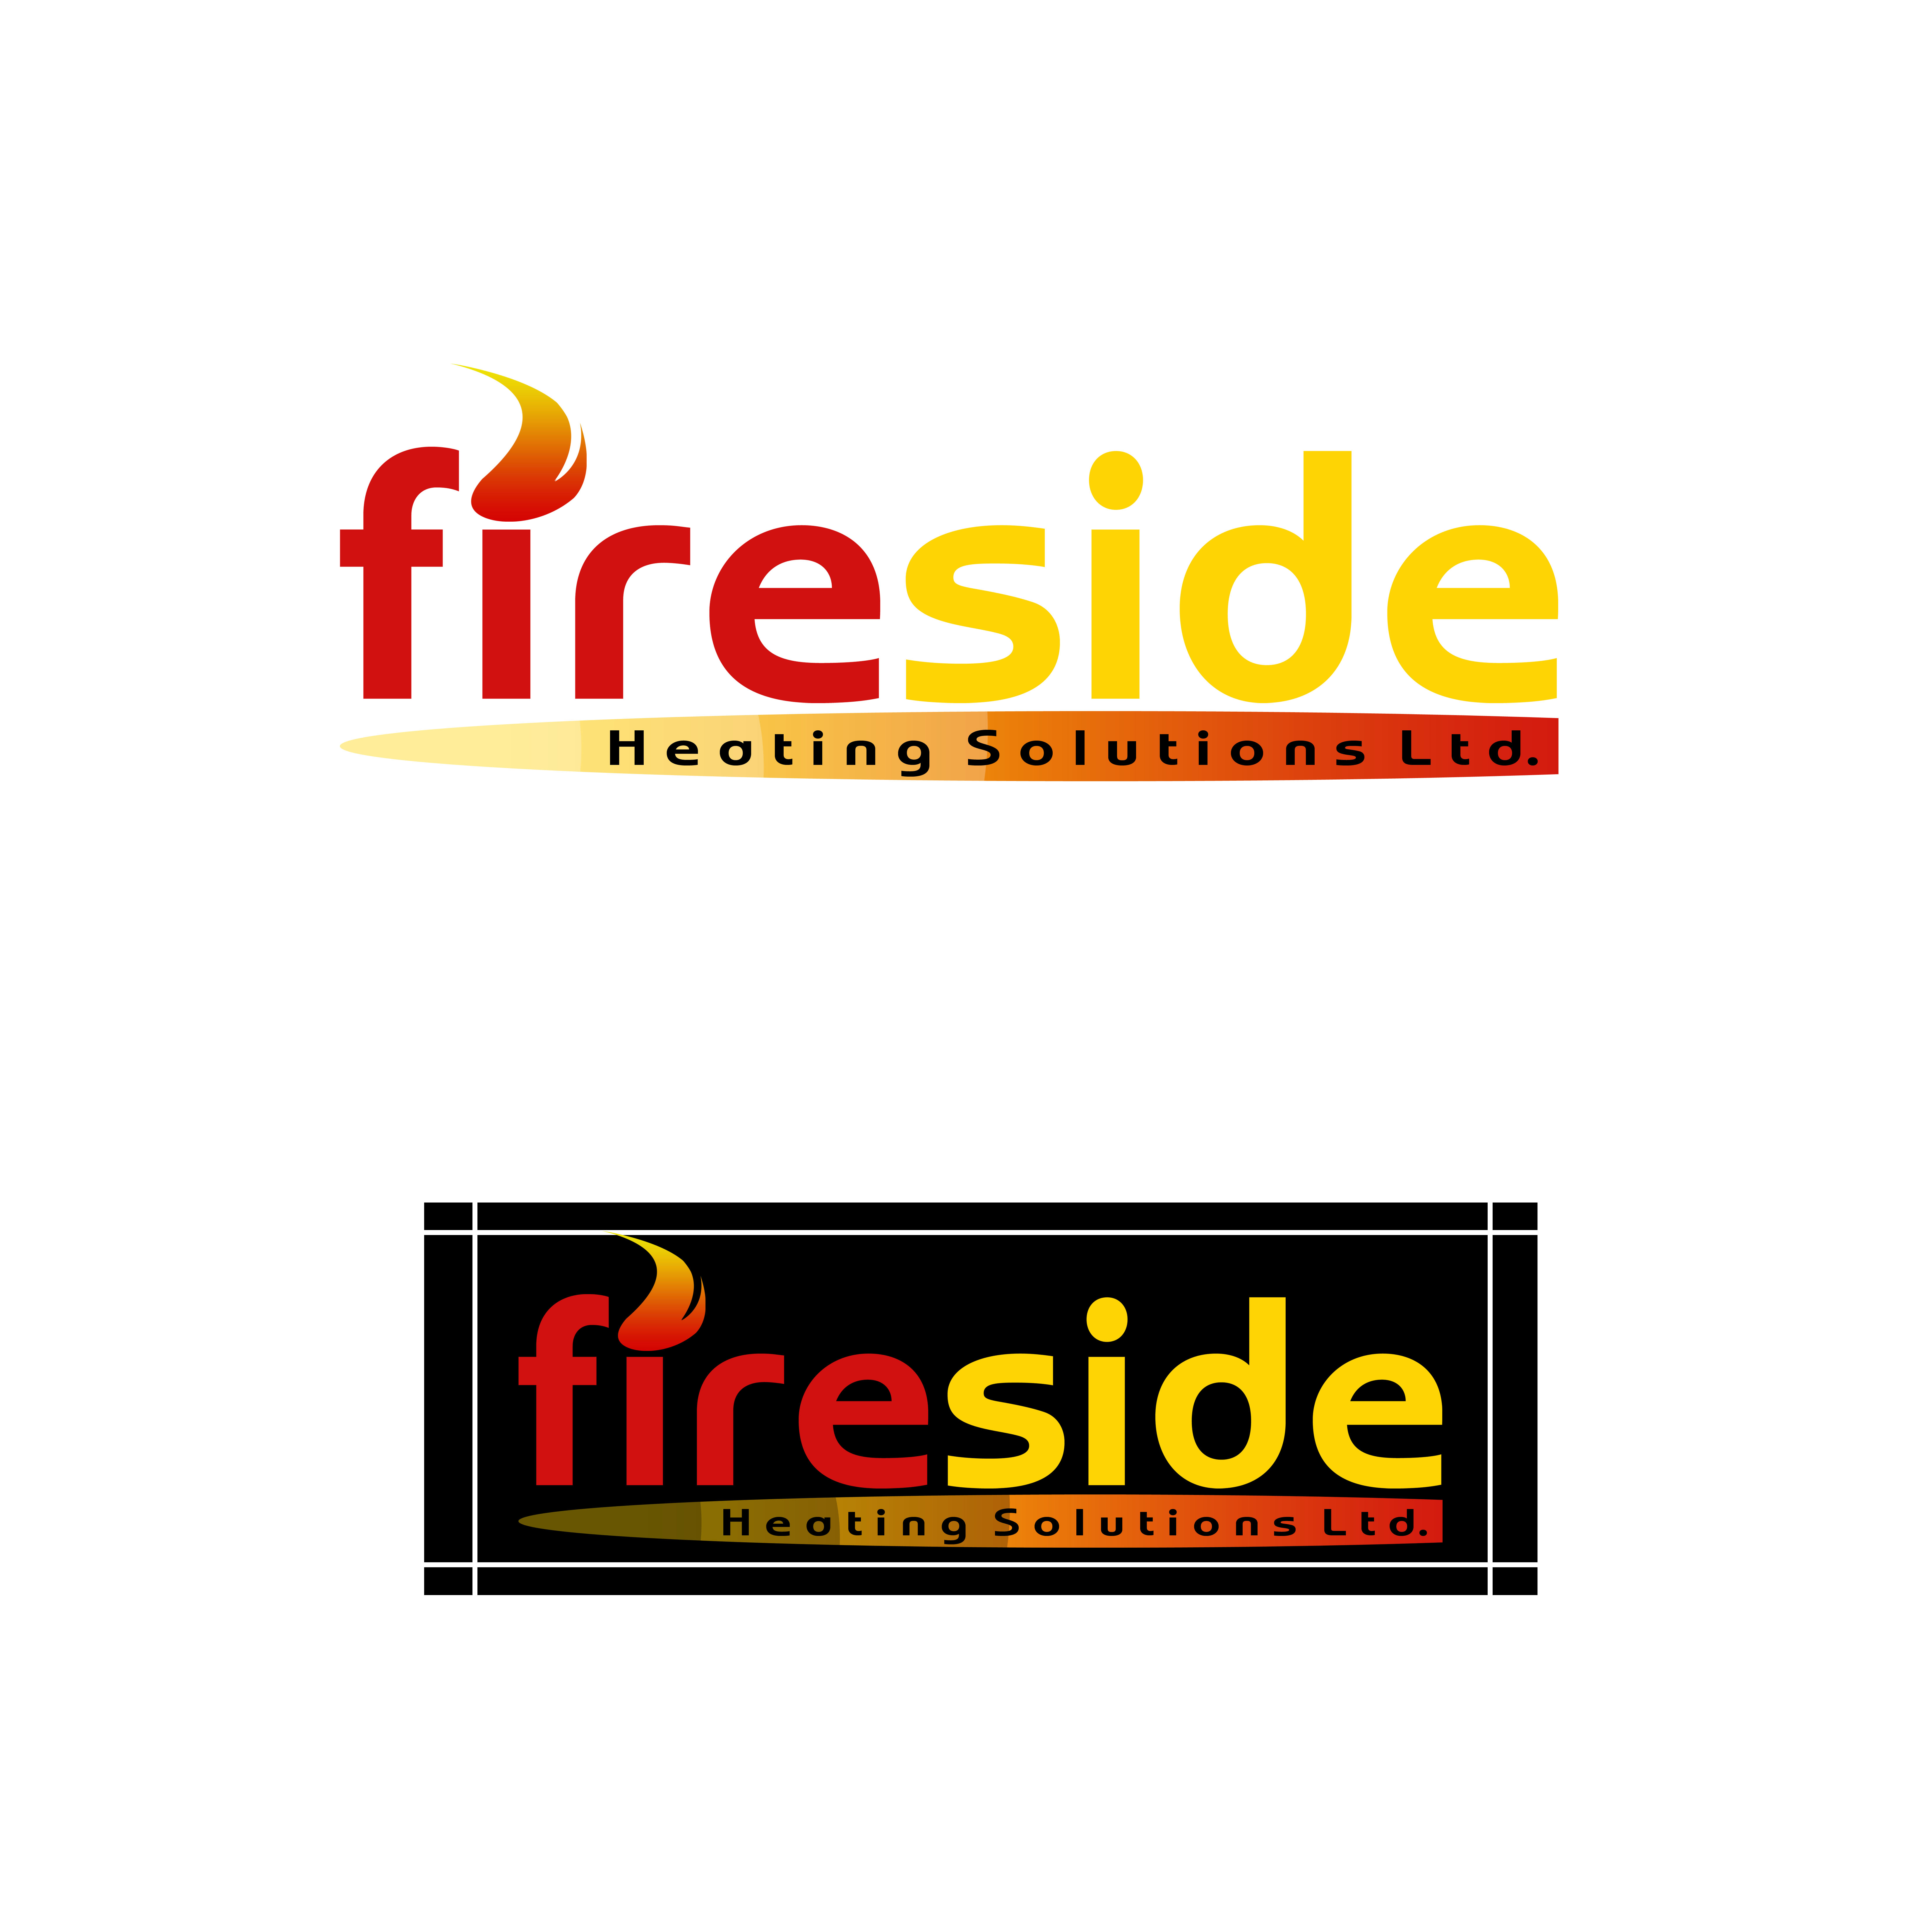 Logo Design by Allan Esclamado - Entry No. 178 in the Logo Design Contest Creative Logo Design for Fireside Heating Solutions Ltd..